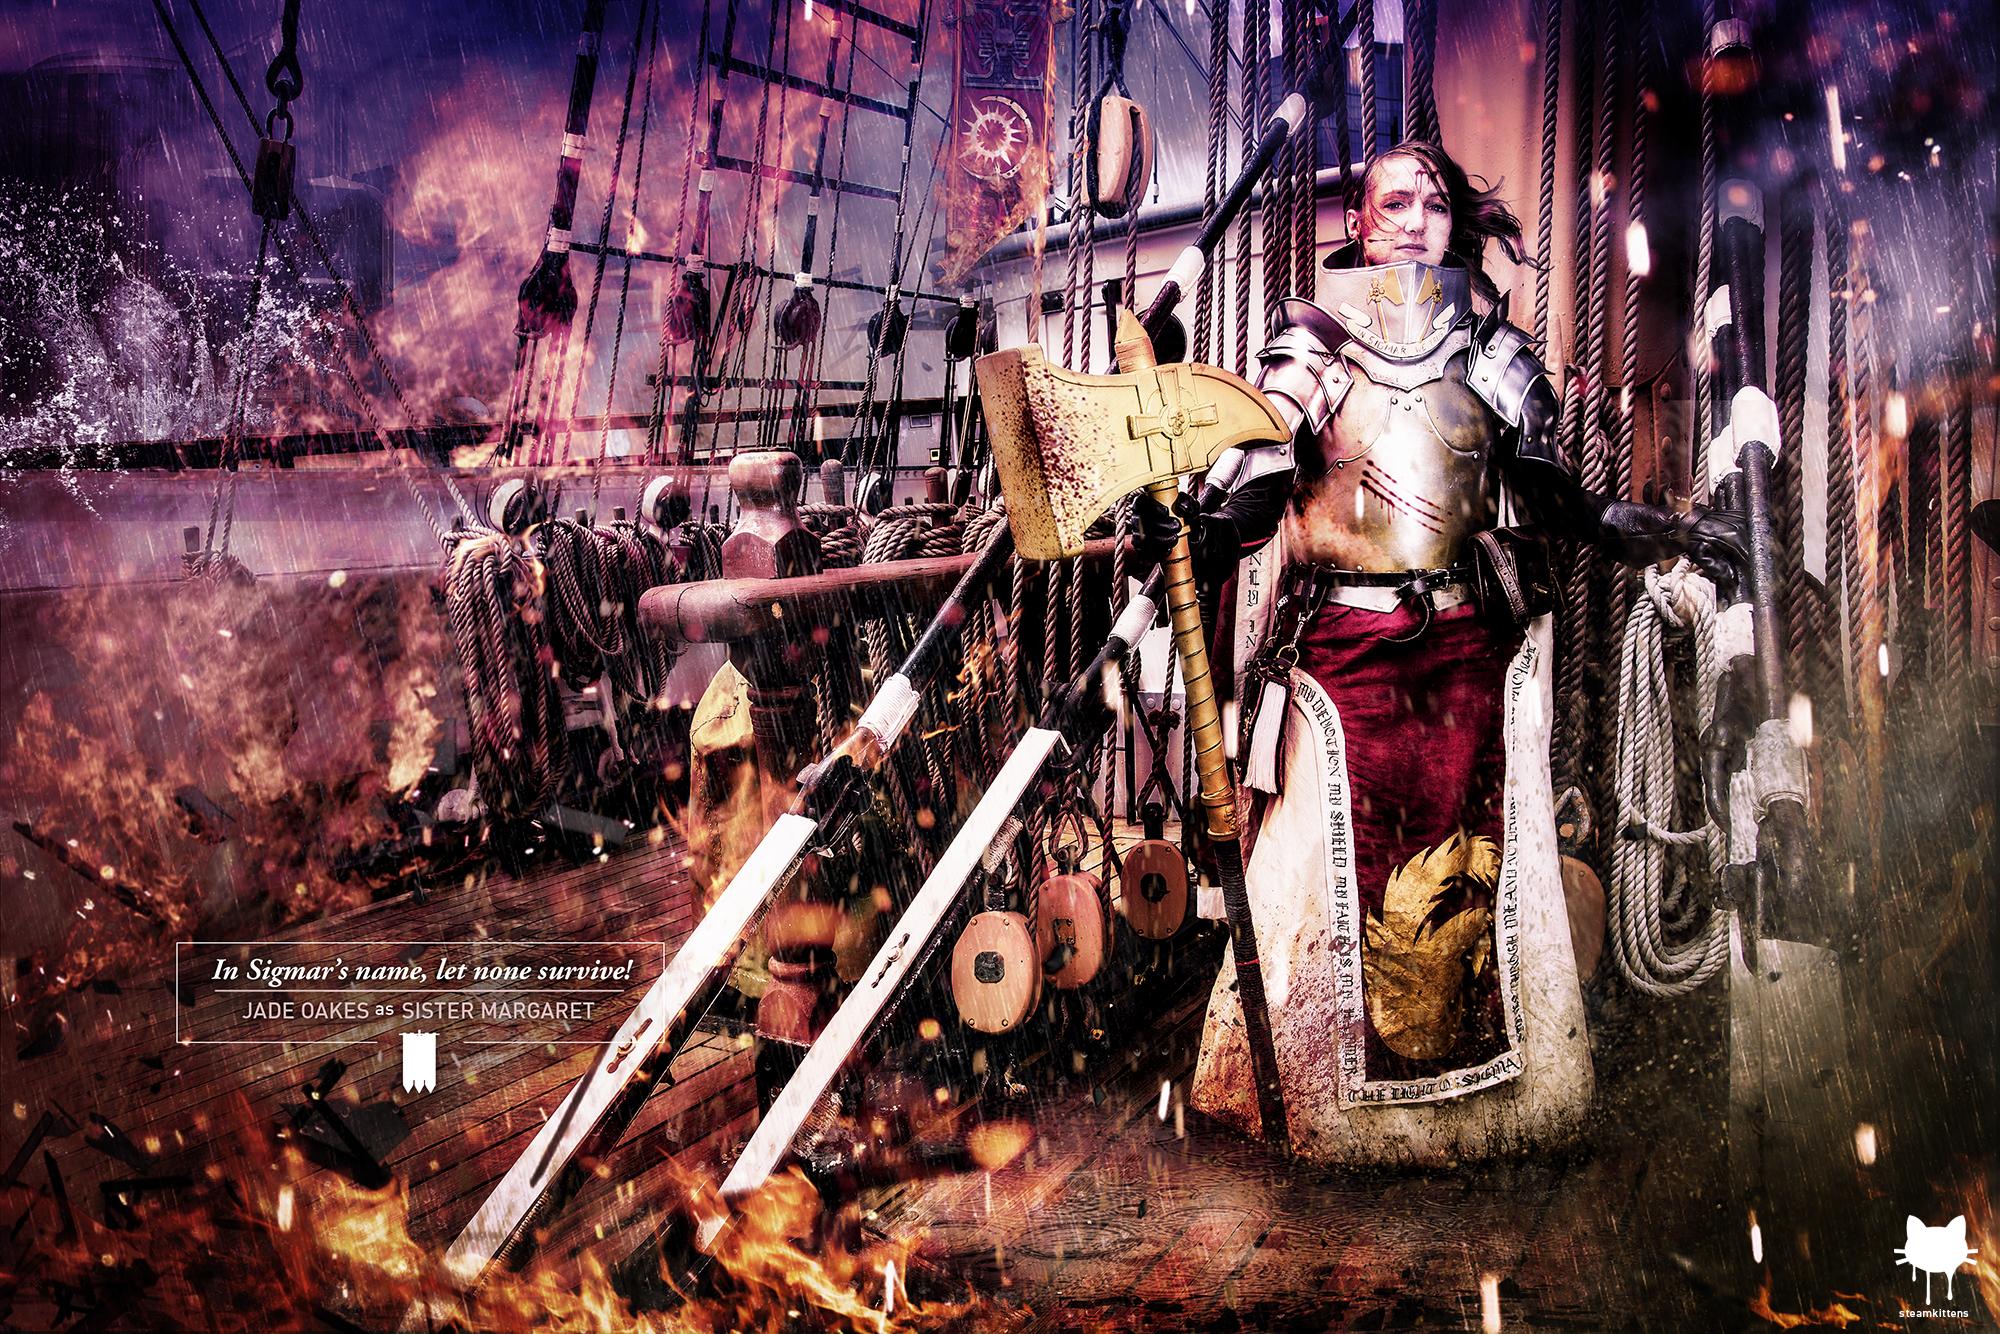 Warrior Priest of Sigmar by steamkittens